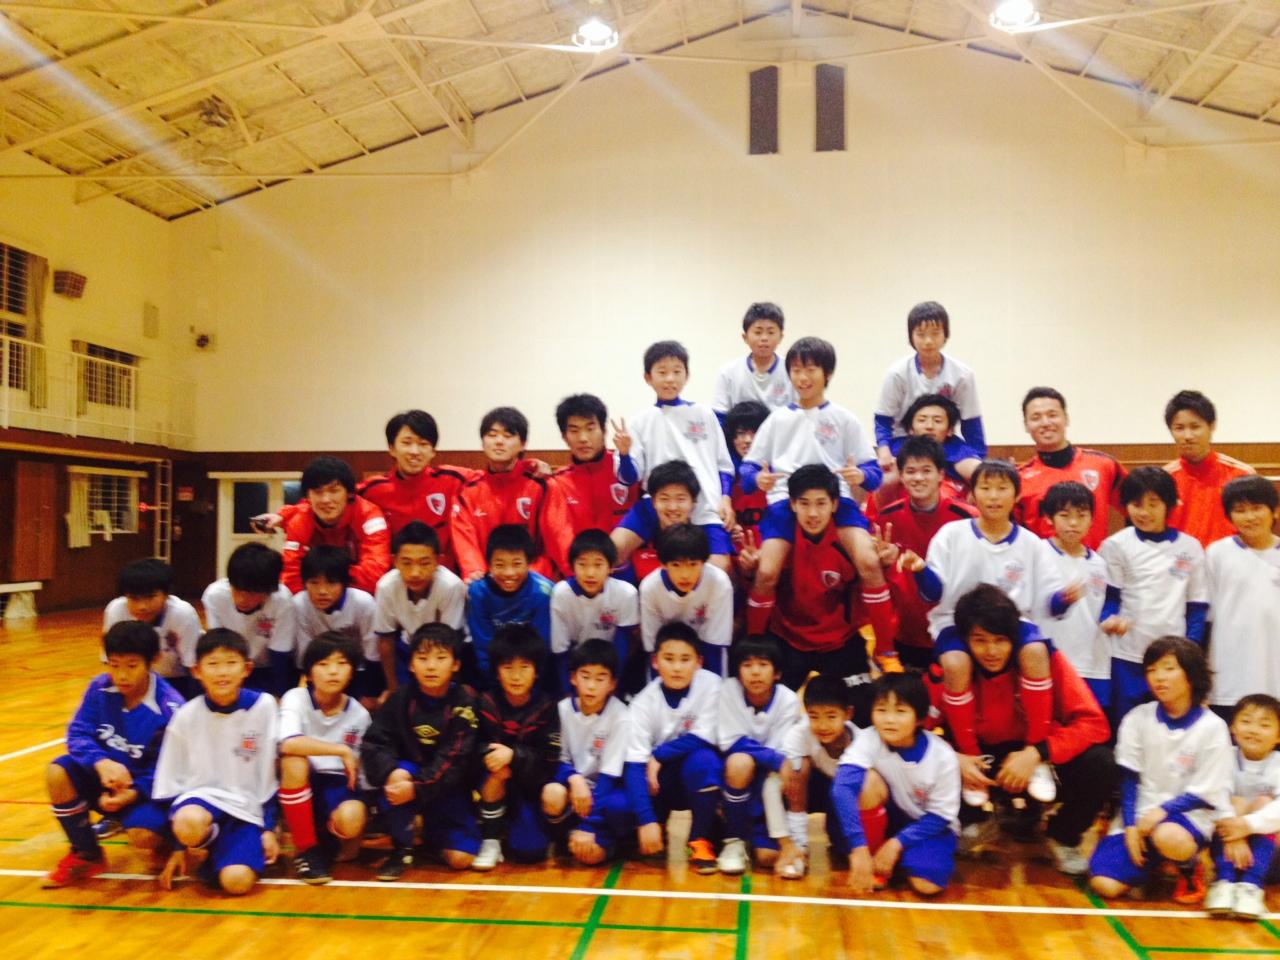 写真 2013-12-26 20 00 50